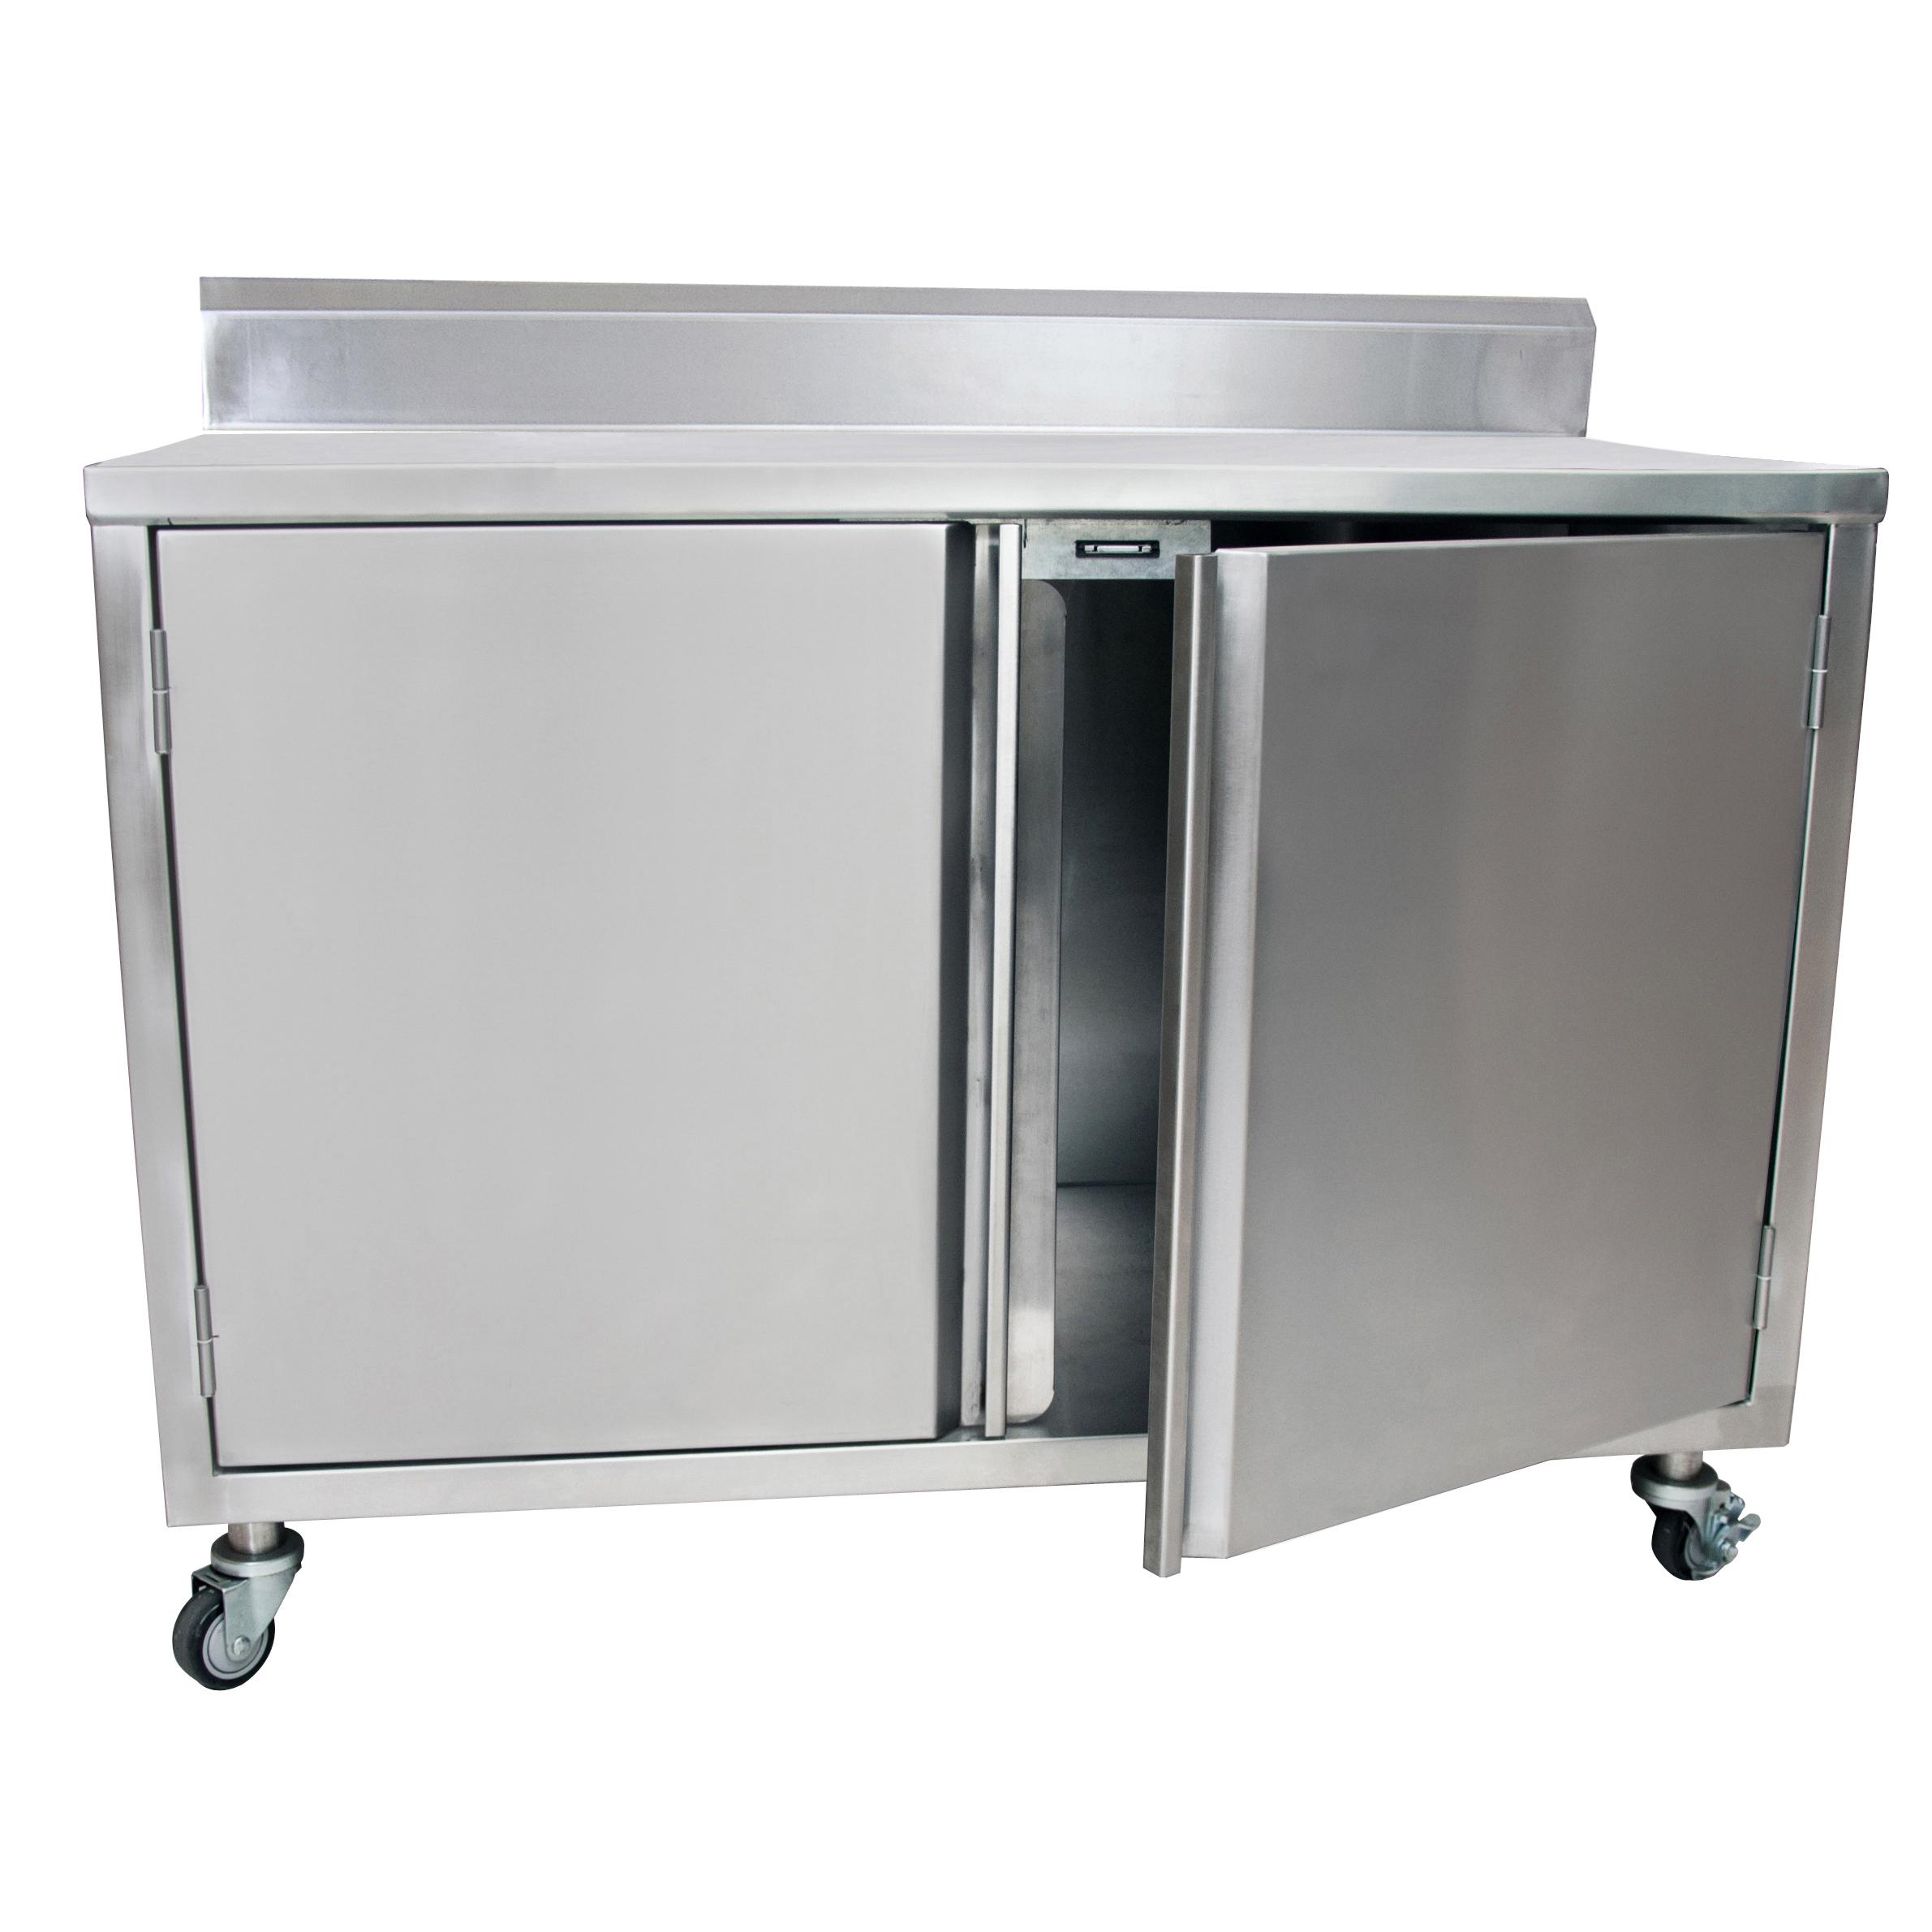 BK Resources BKDCR5-3096H work table, cabinet base hinged doors